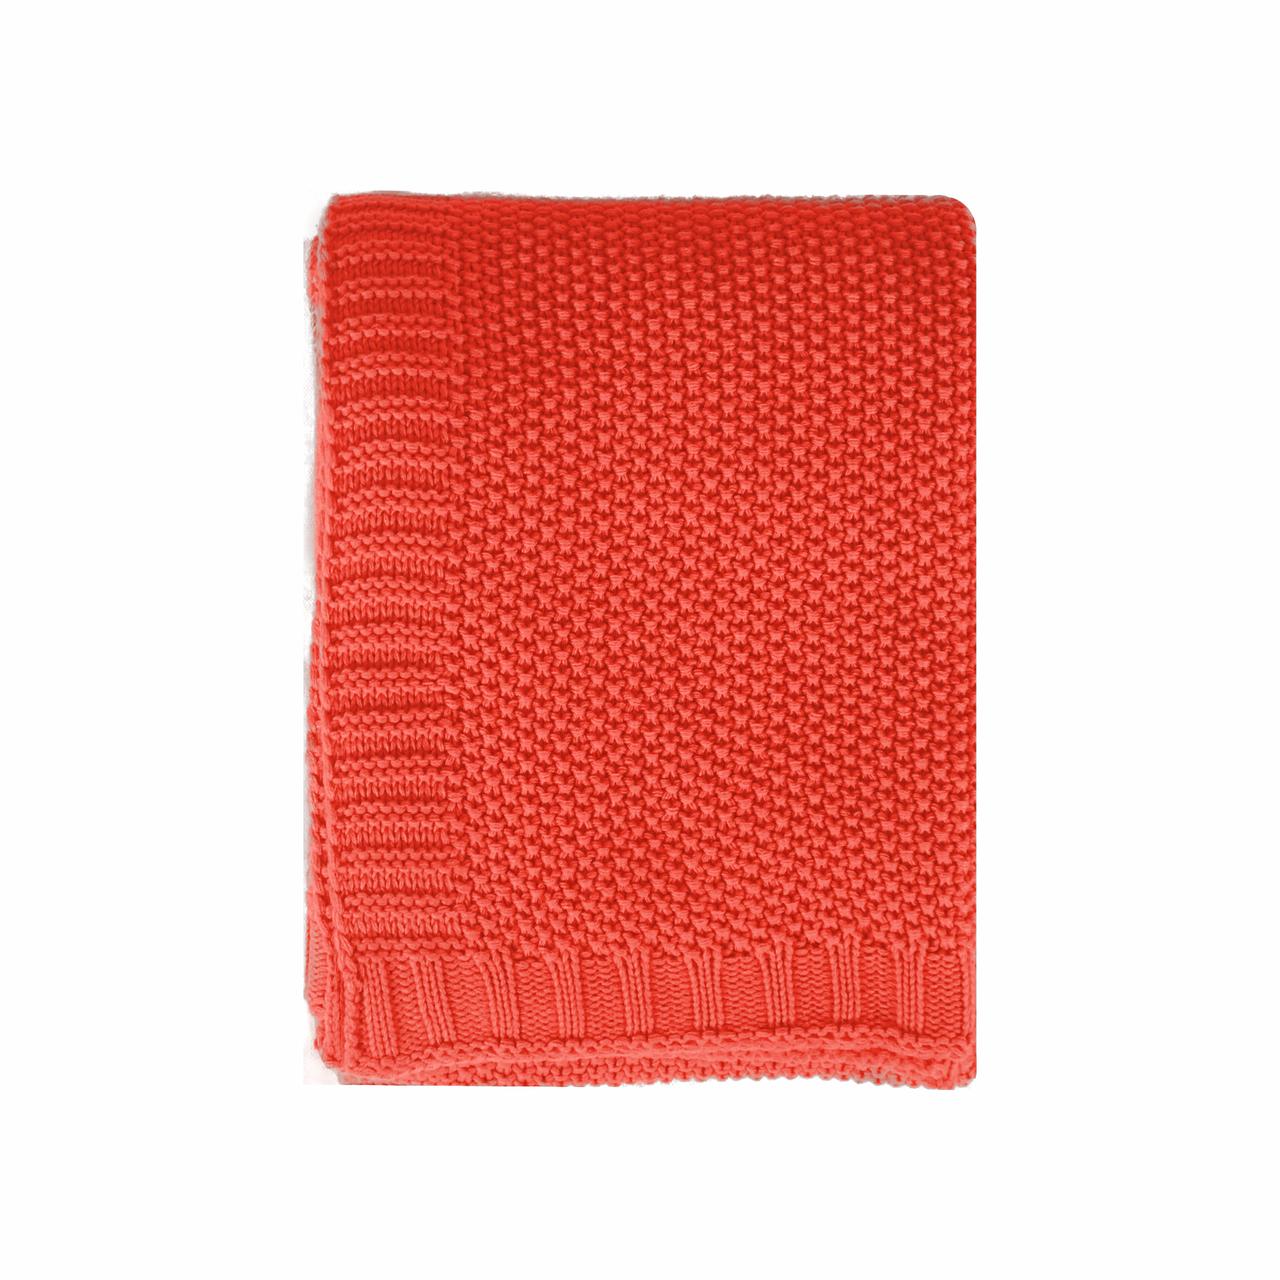 In 2 Linen Chelsea Knitted Throw Rug | Orange